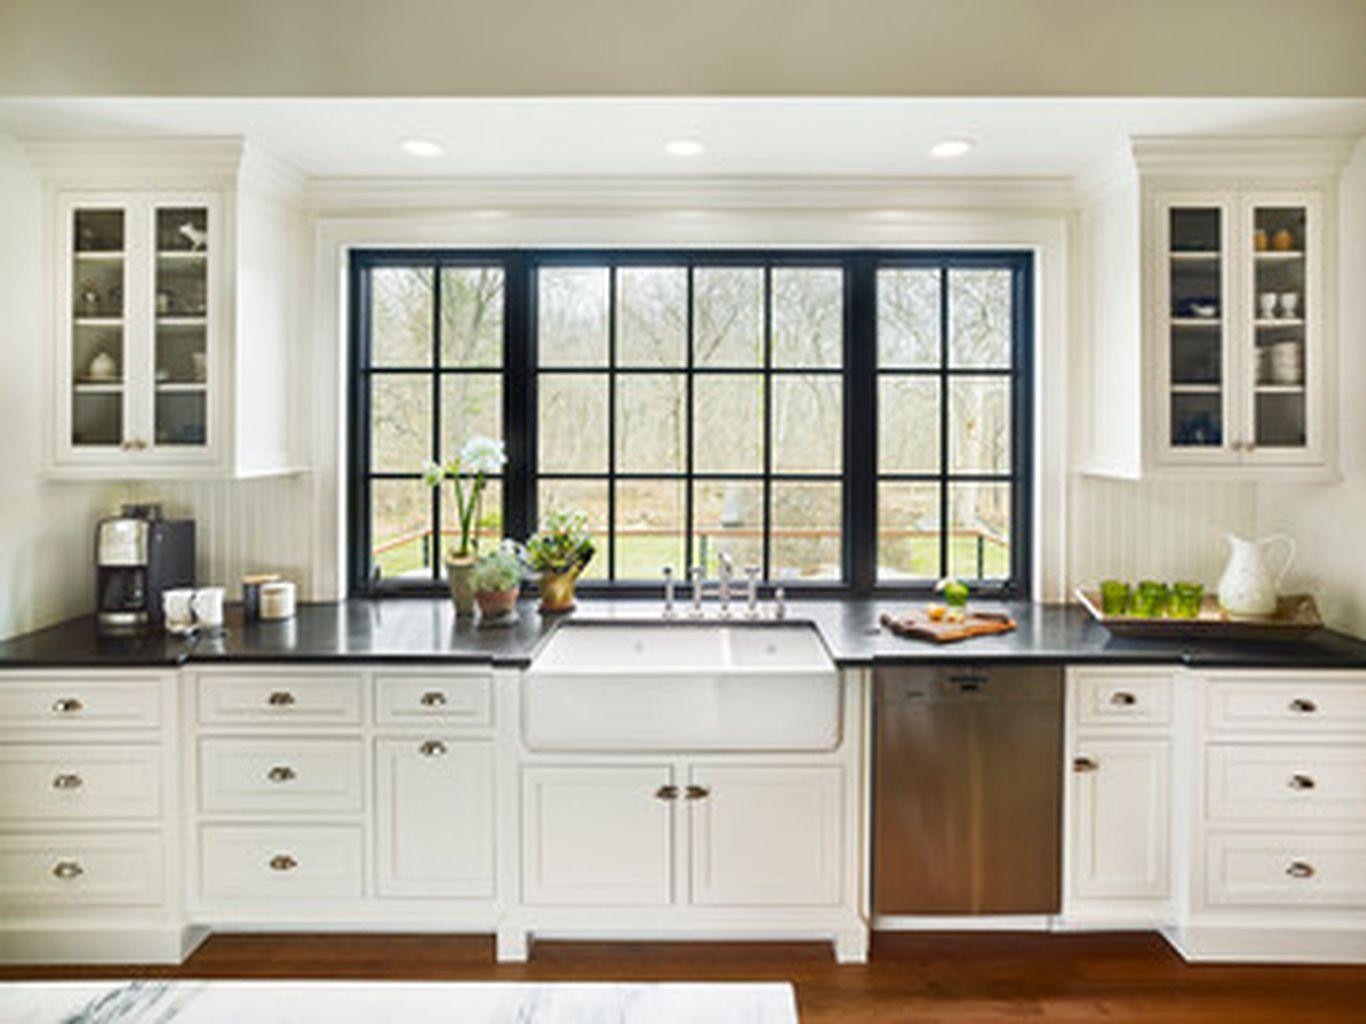 Modern Farmhouse Kitchen Design Modern Farmhouse Kitchen Design